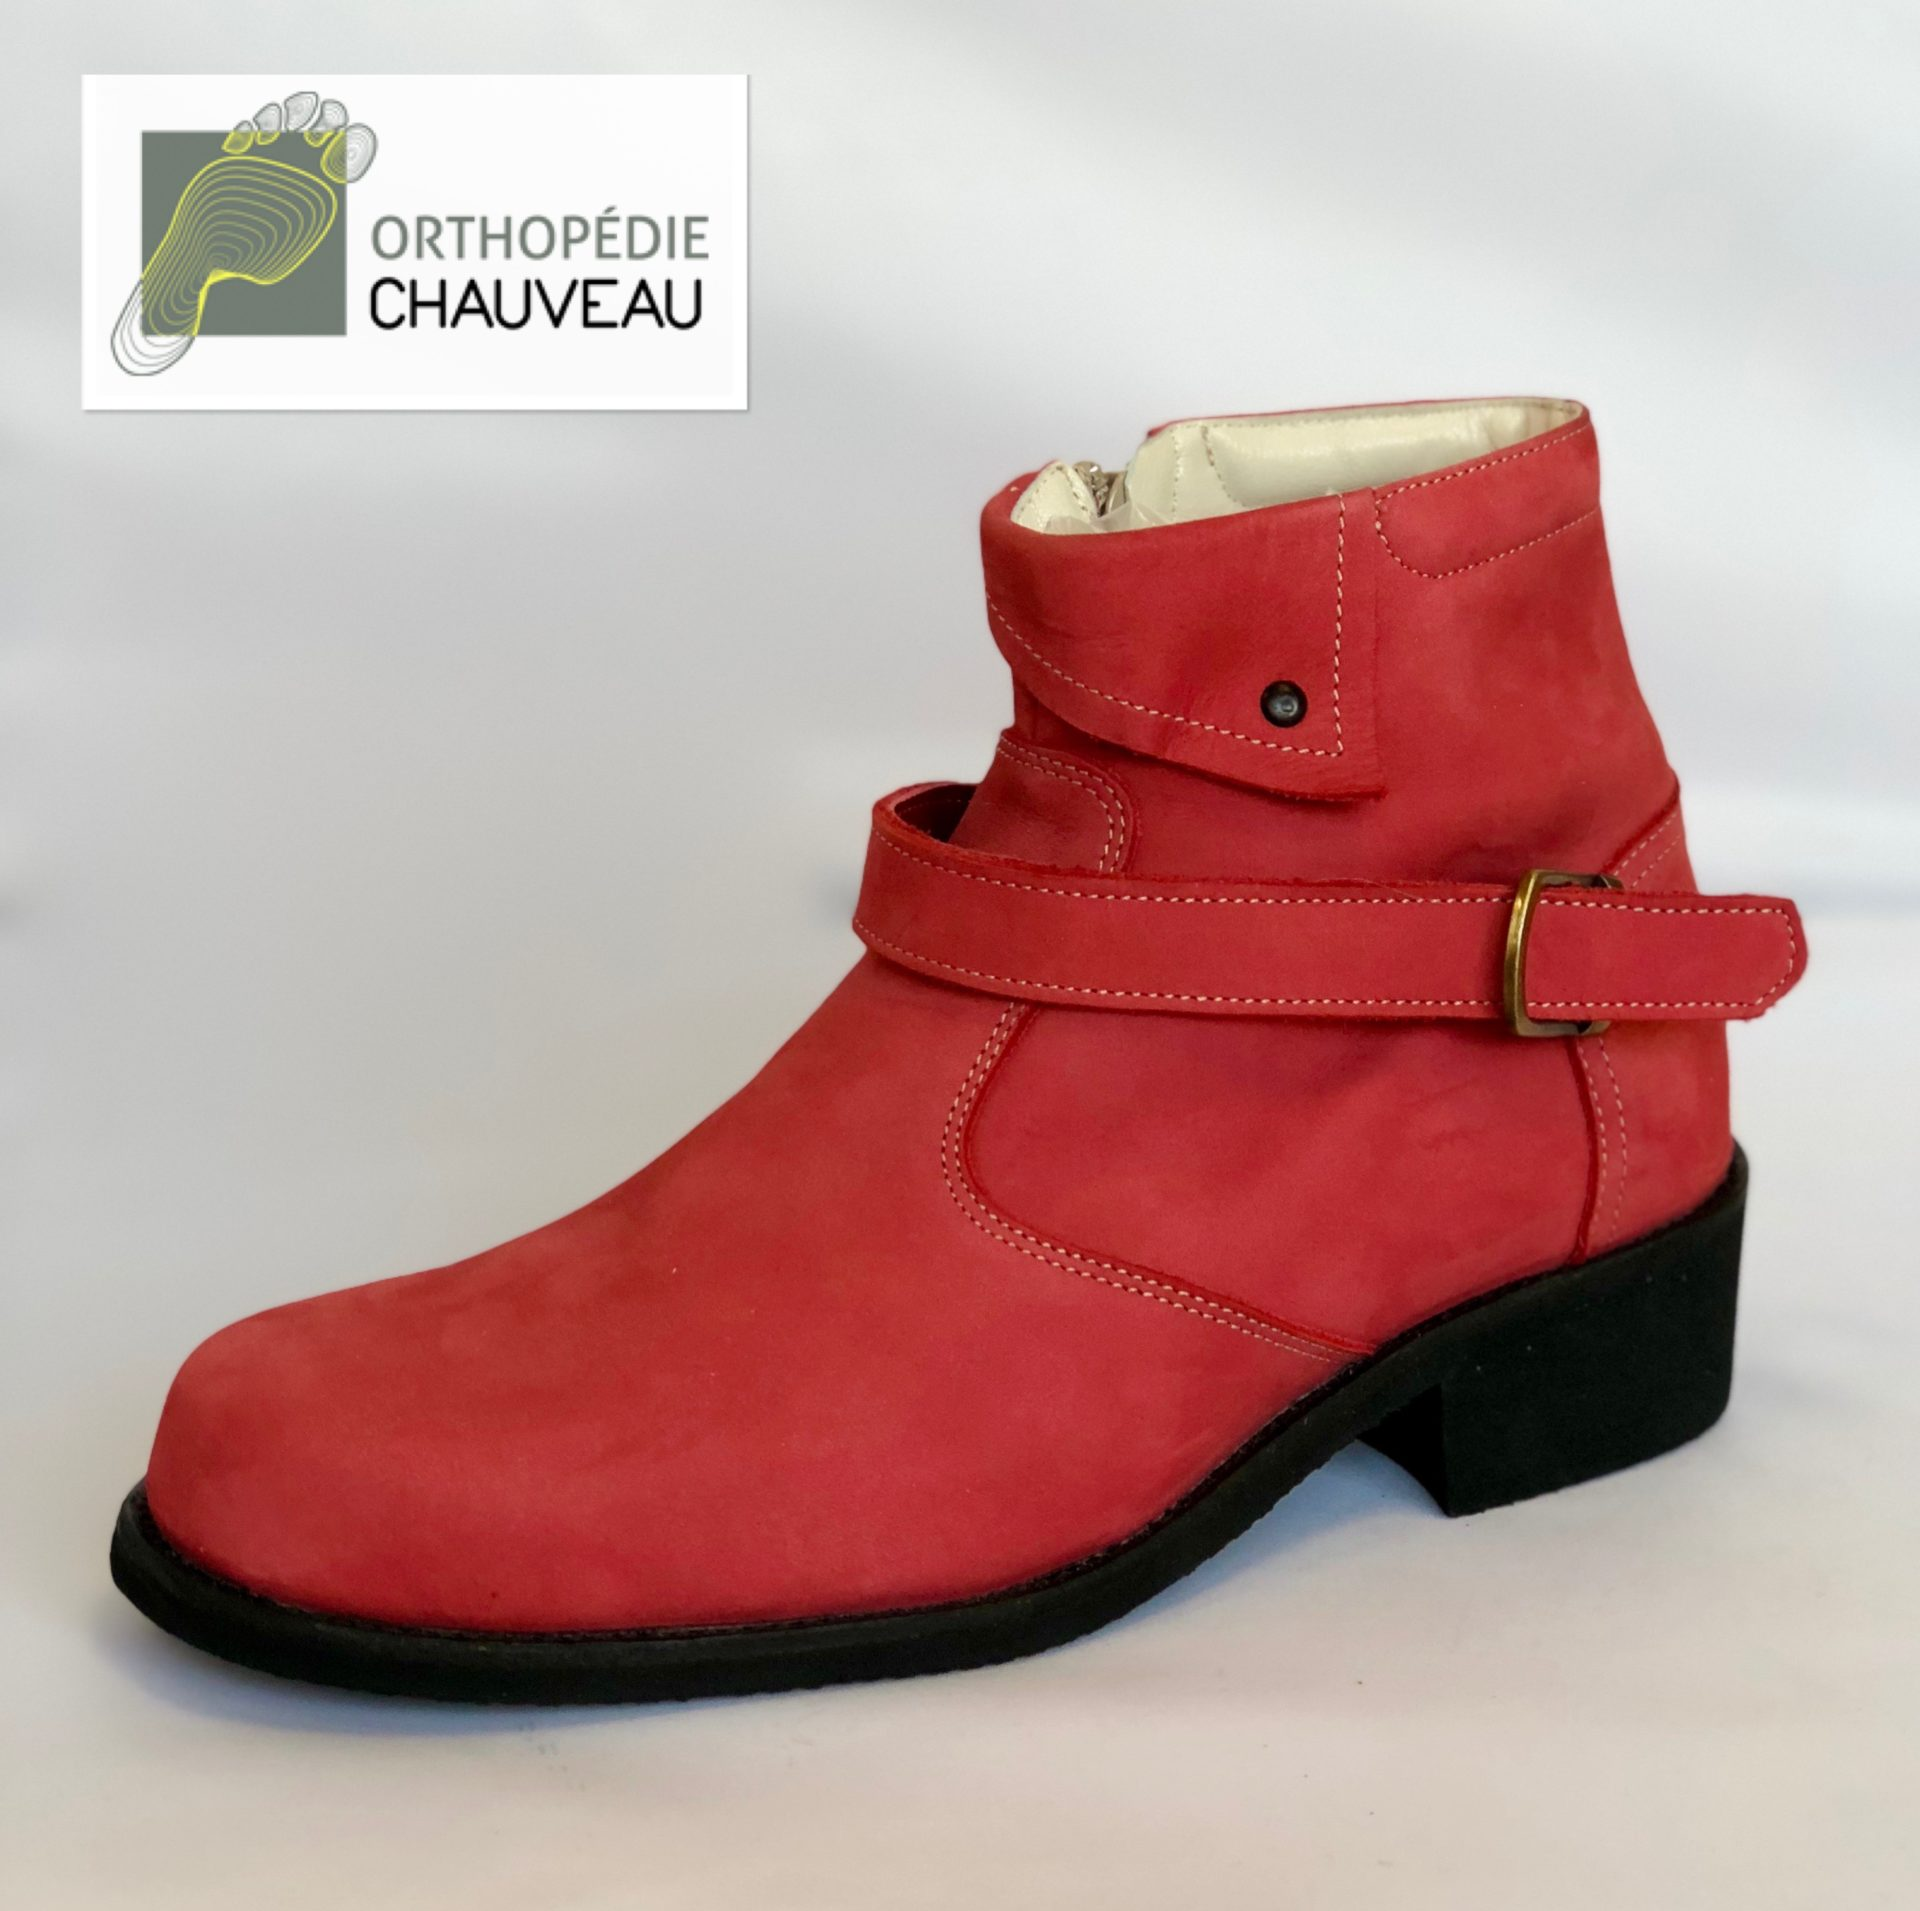 chaussures orthopediques Rennes bottines femme